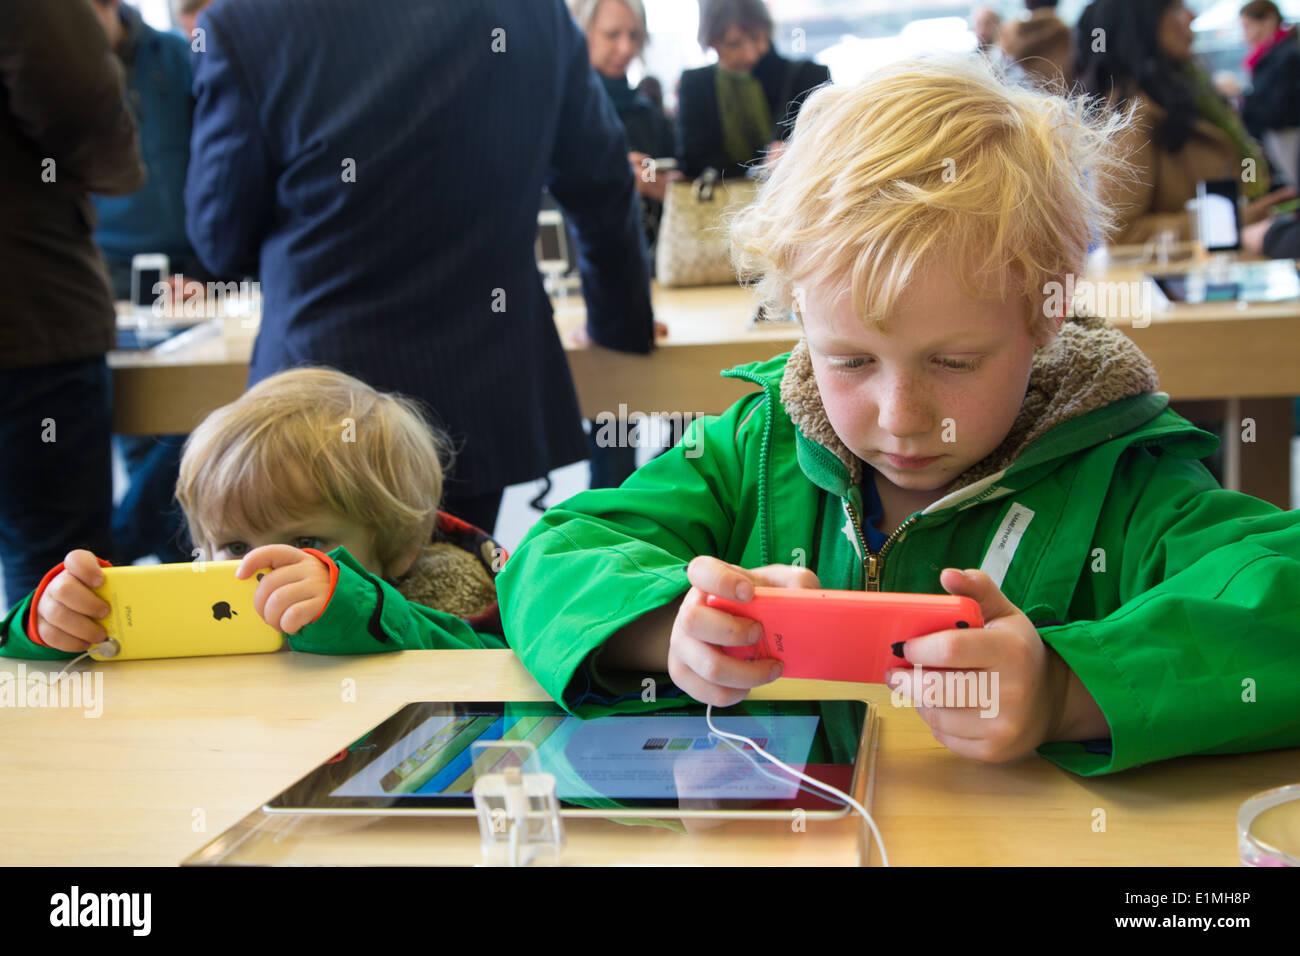 Apple Retail Store Stock Photos & Apple Retail Store Stock Images ...